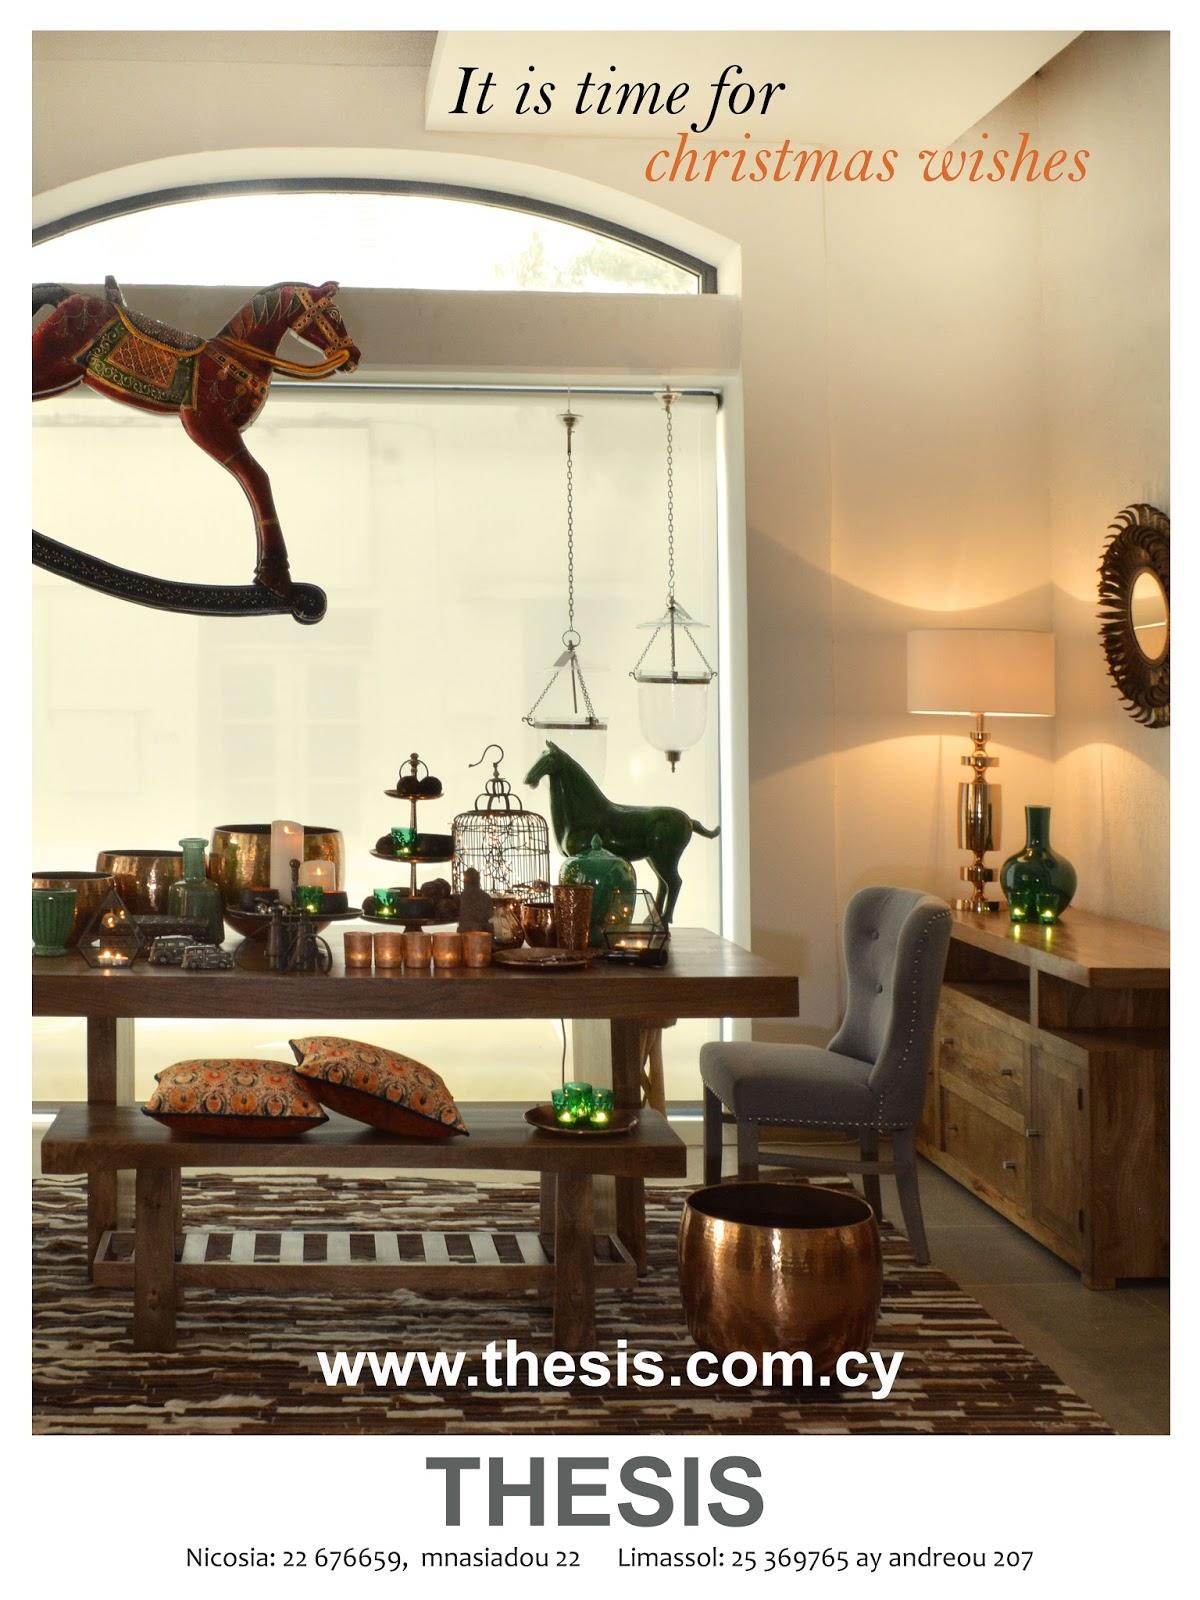 thesis furniture cyprus Cyprus furnishings login/register nicosia furnishings nicosia furnishings thesis furniture home & deco andreotti furniture.